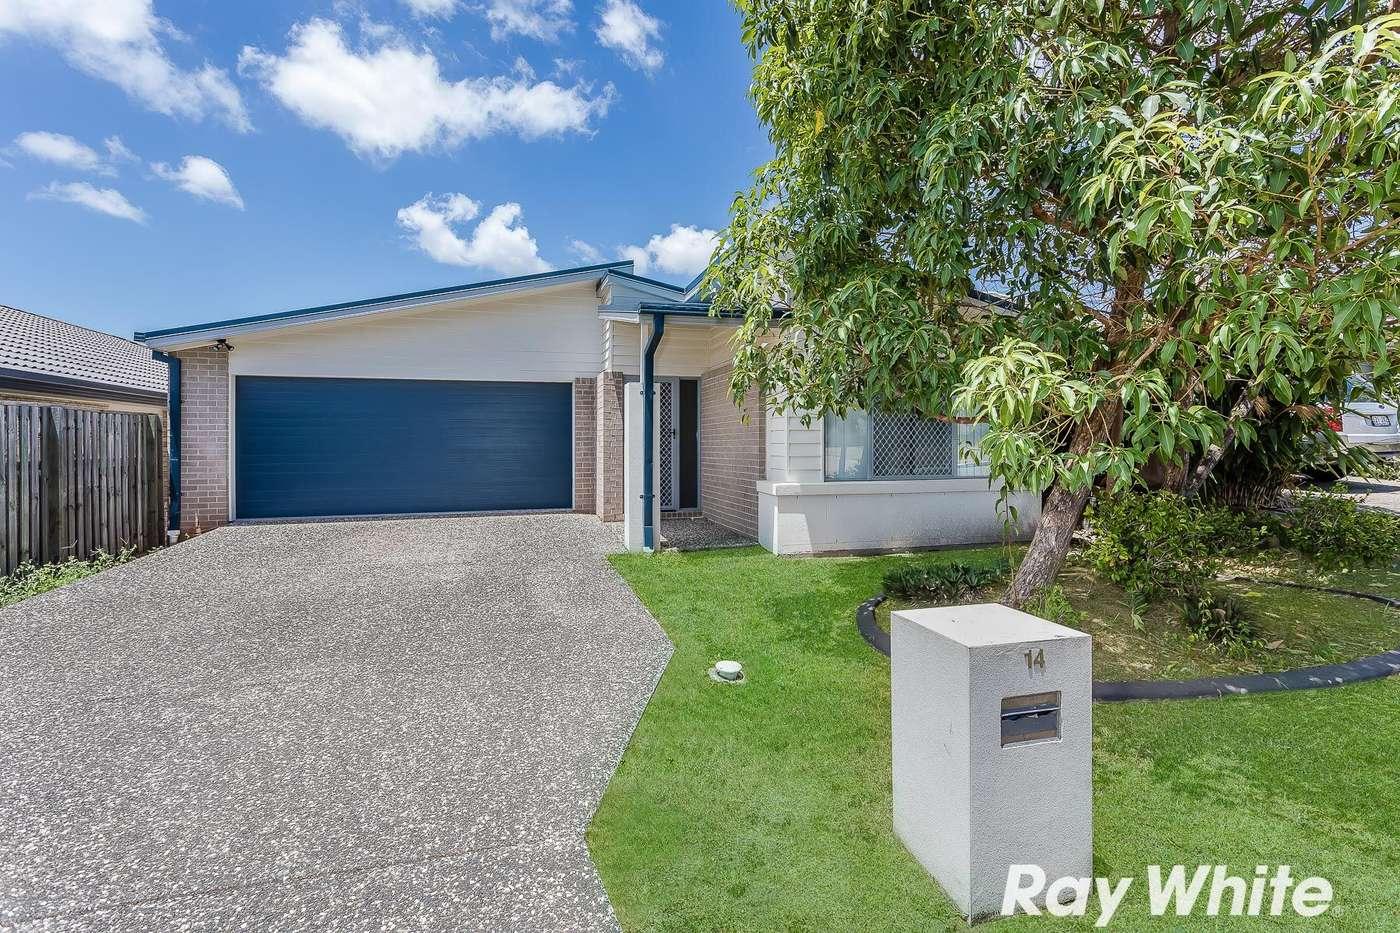 Main view of Homely house listing, 14 Kingfisher Street, Dakabin, QLD 4503